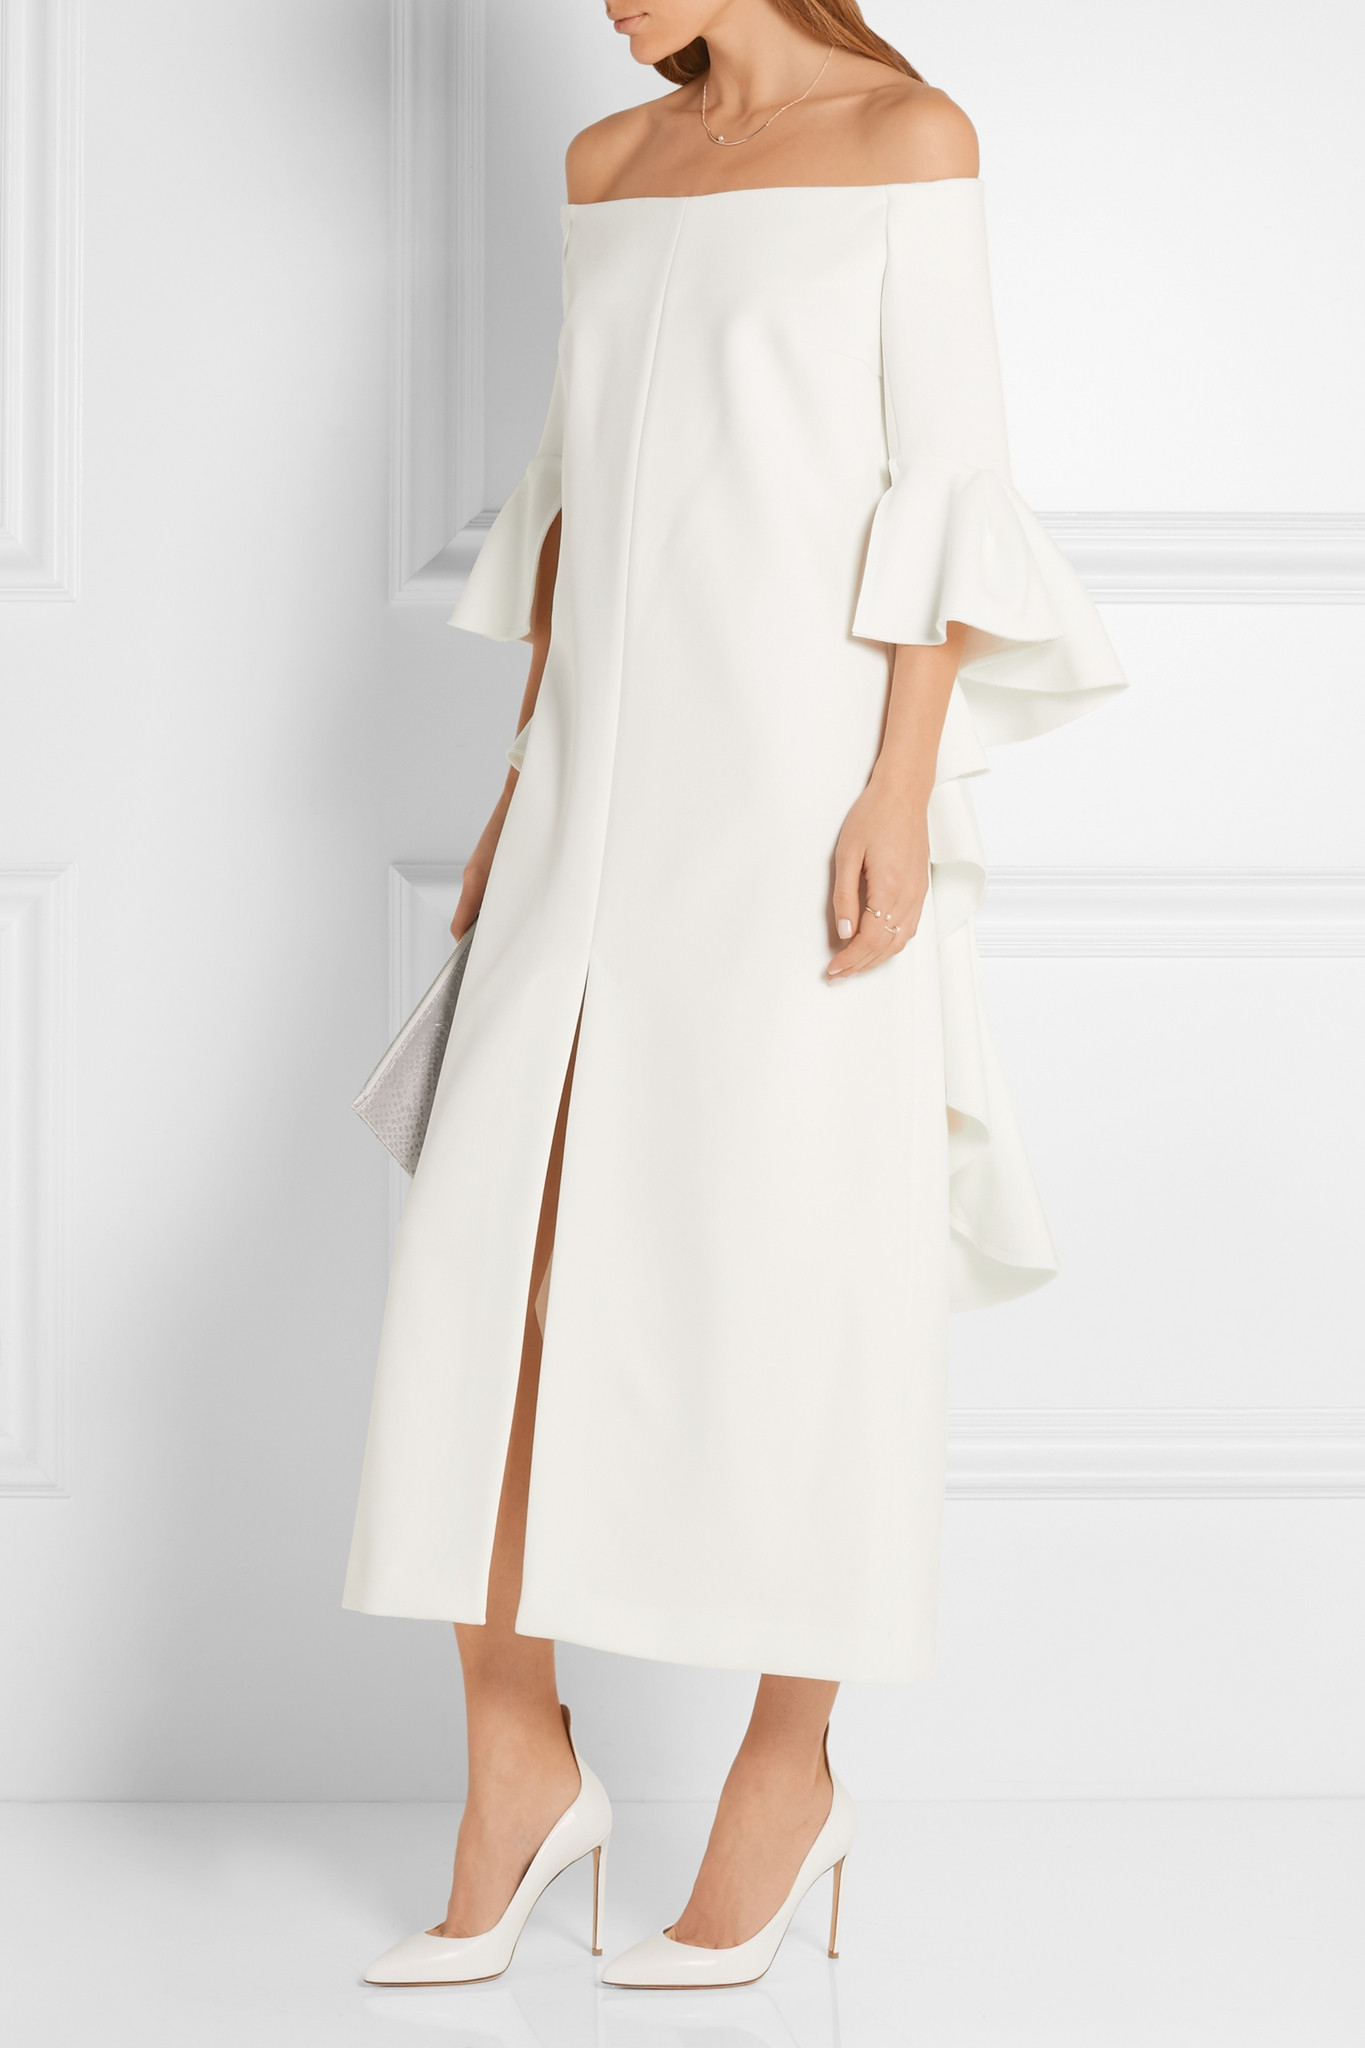 DRESSES - Short dresses Ellery 1faLo42Krv